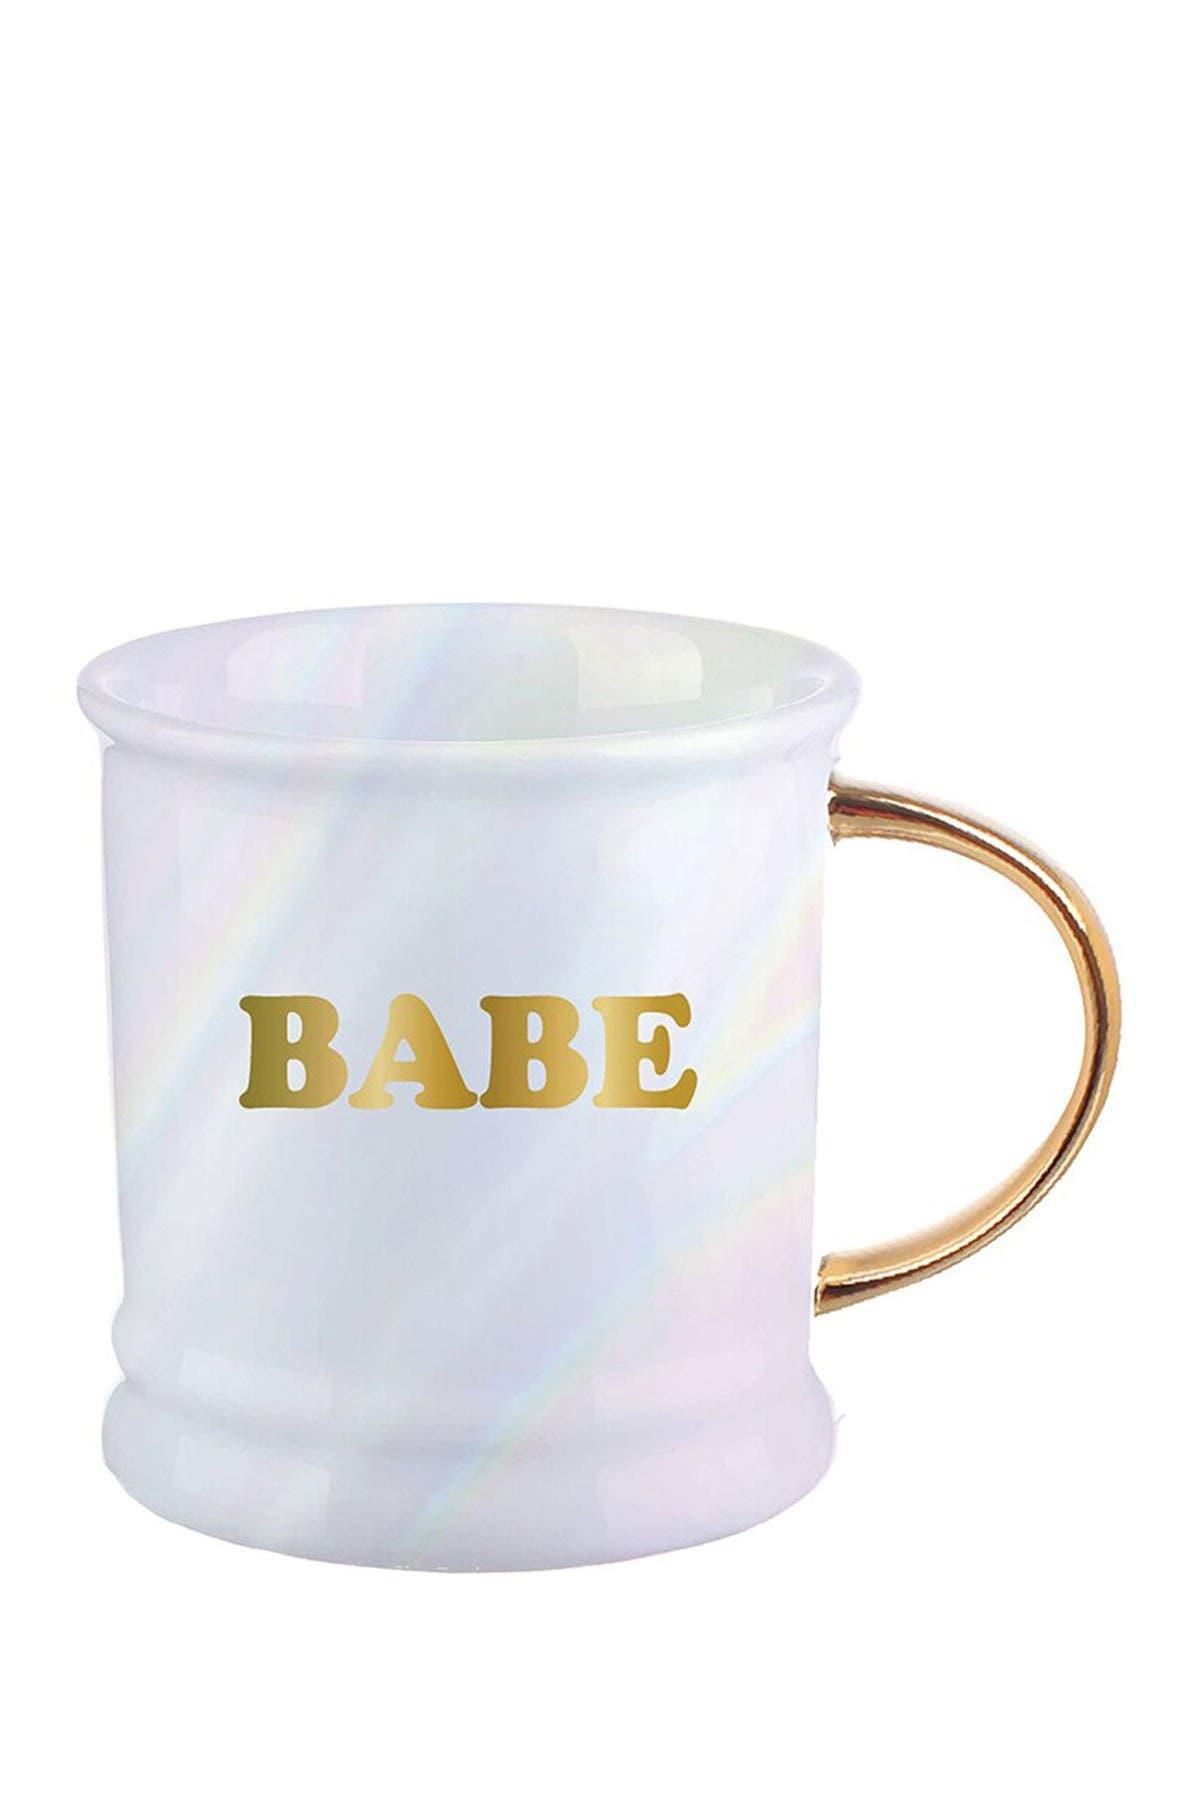 Image of SLANT COLLECTIONS Babe Mug